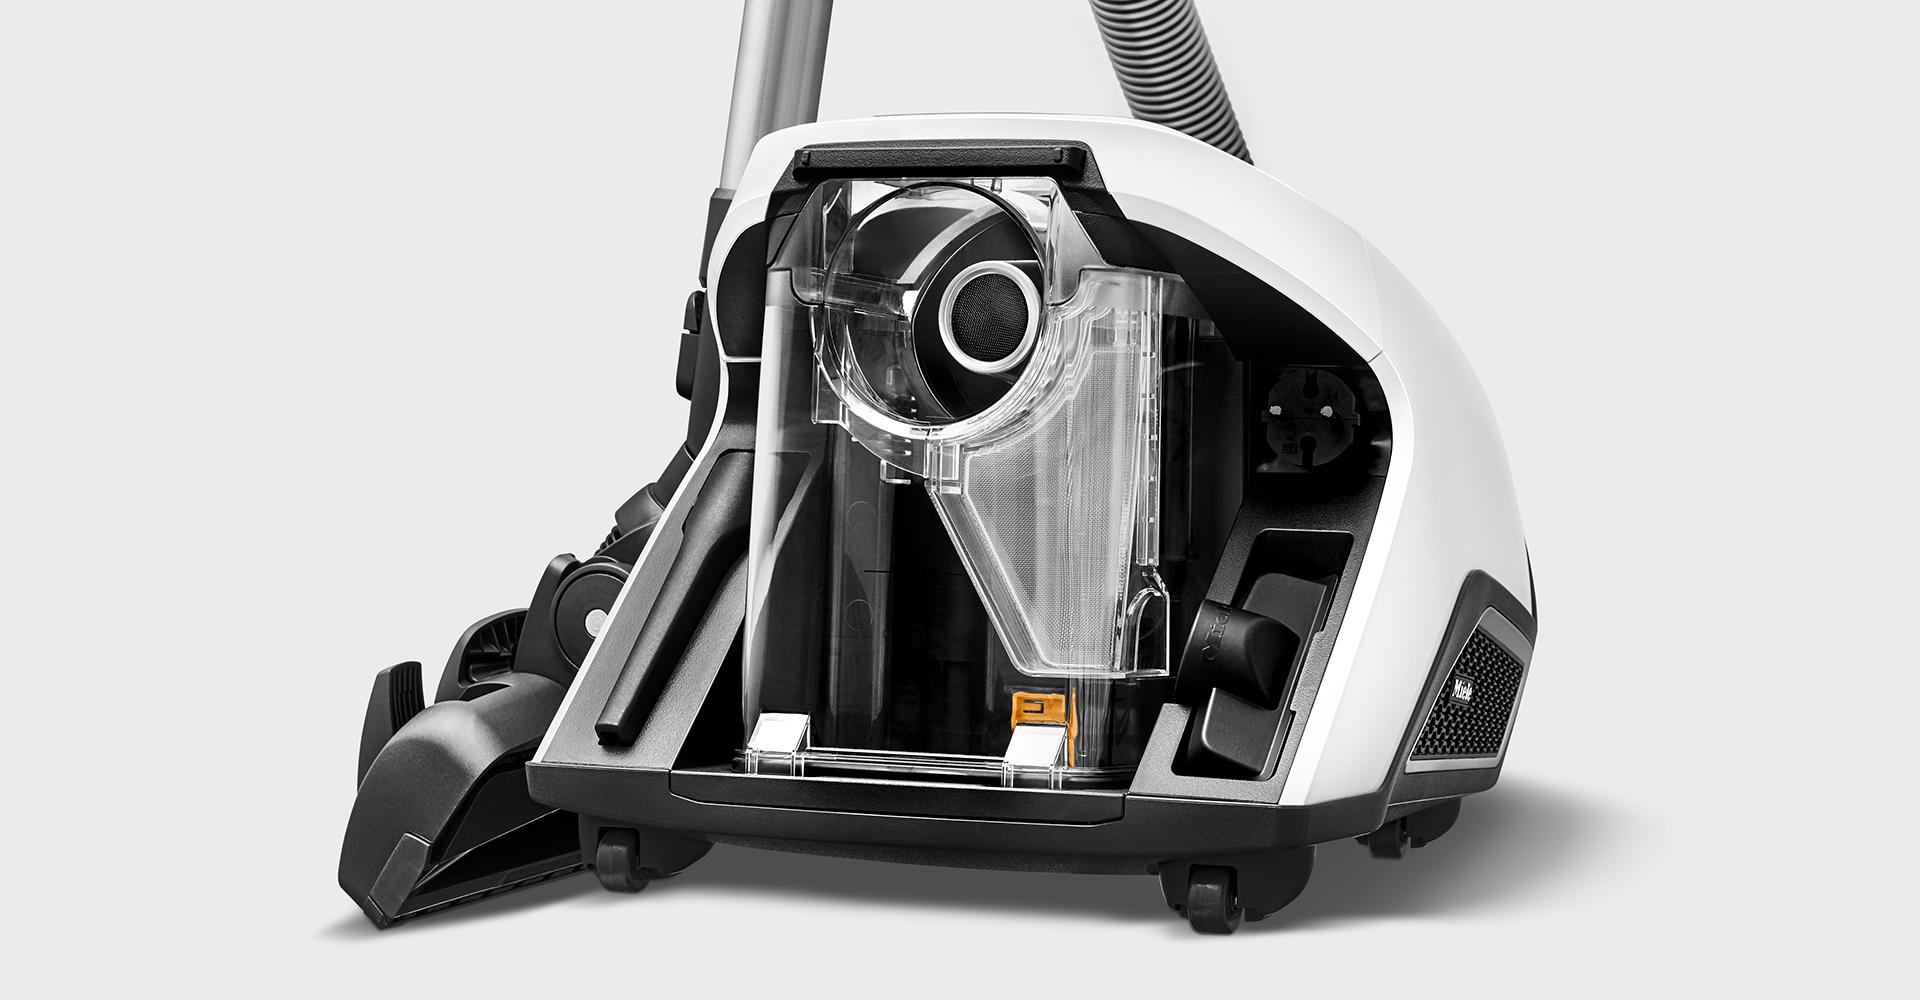 Miele Blizzard Cx1 Bagless Vacuum Cleaner 187 Miele